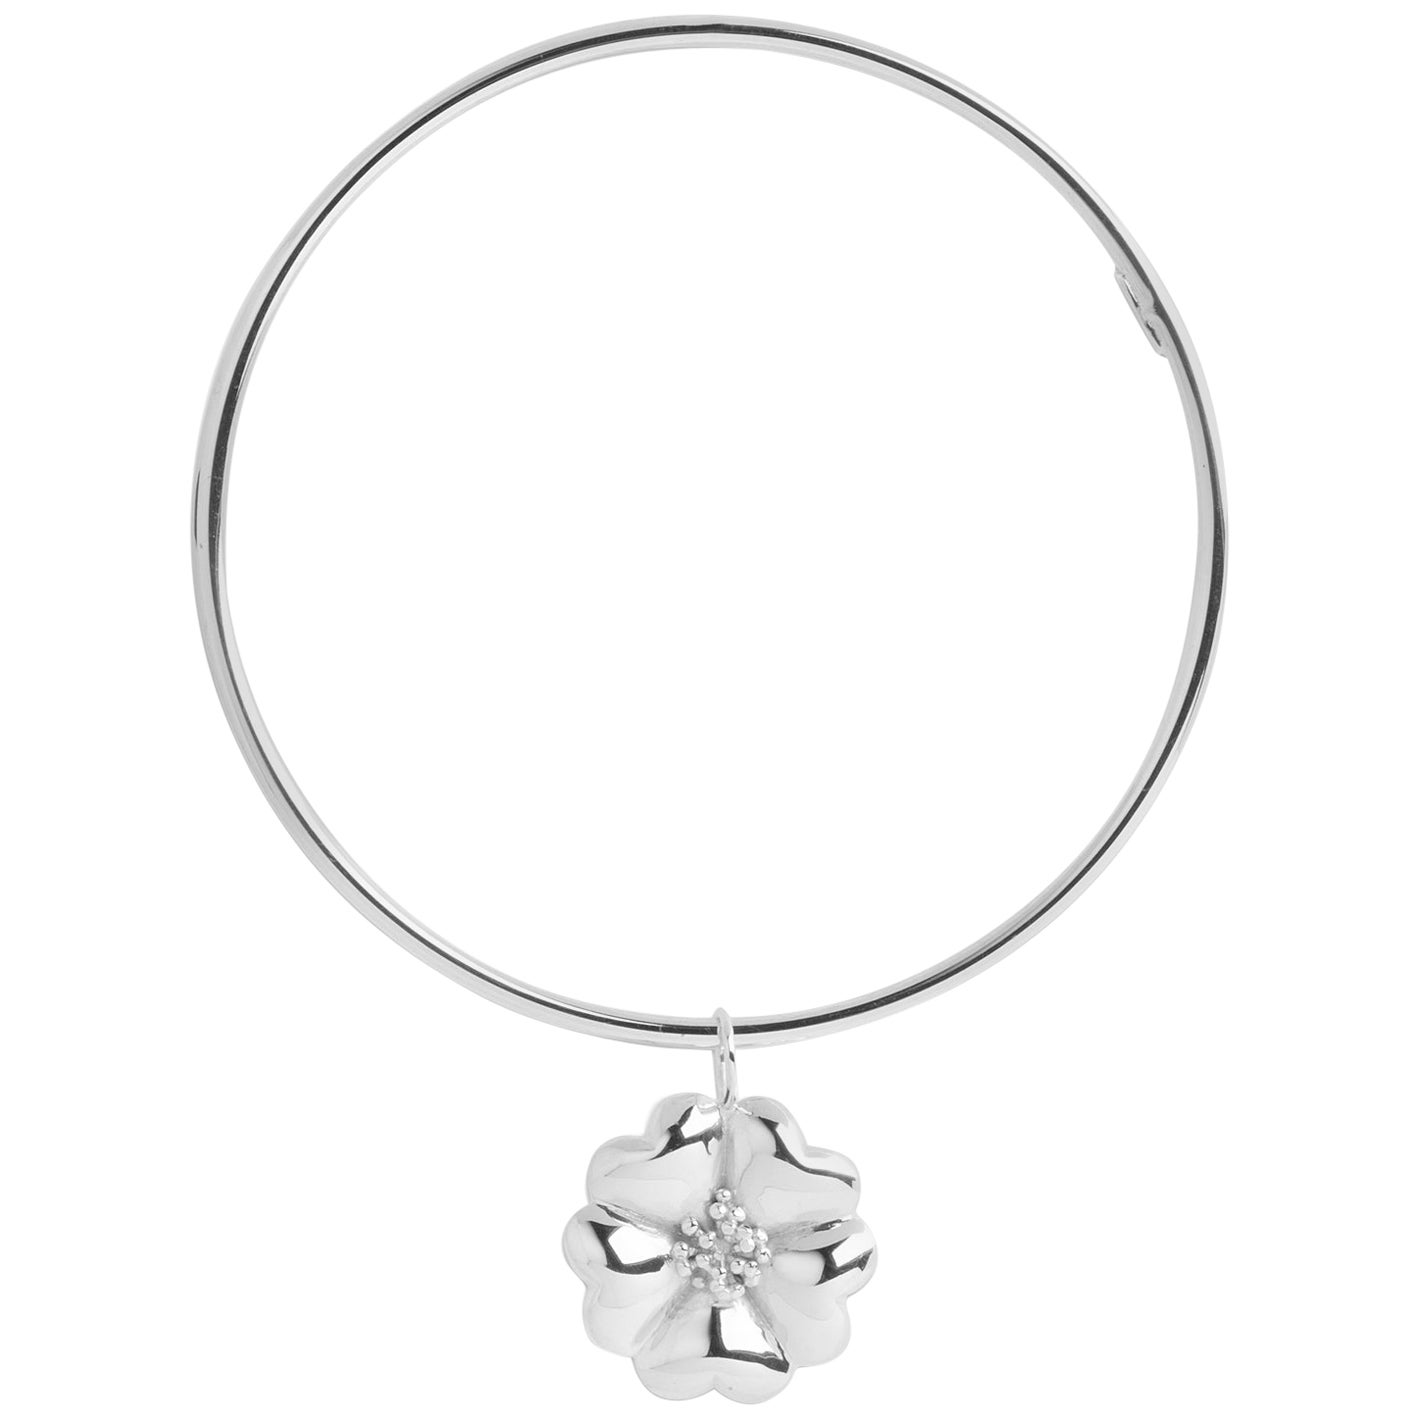 .925 Sterling Silver Blossom Dangle Bangle Bracelet